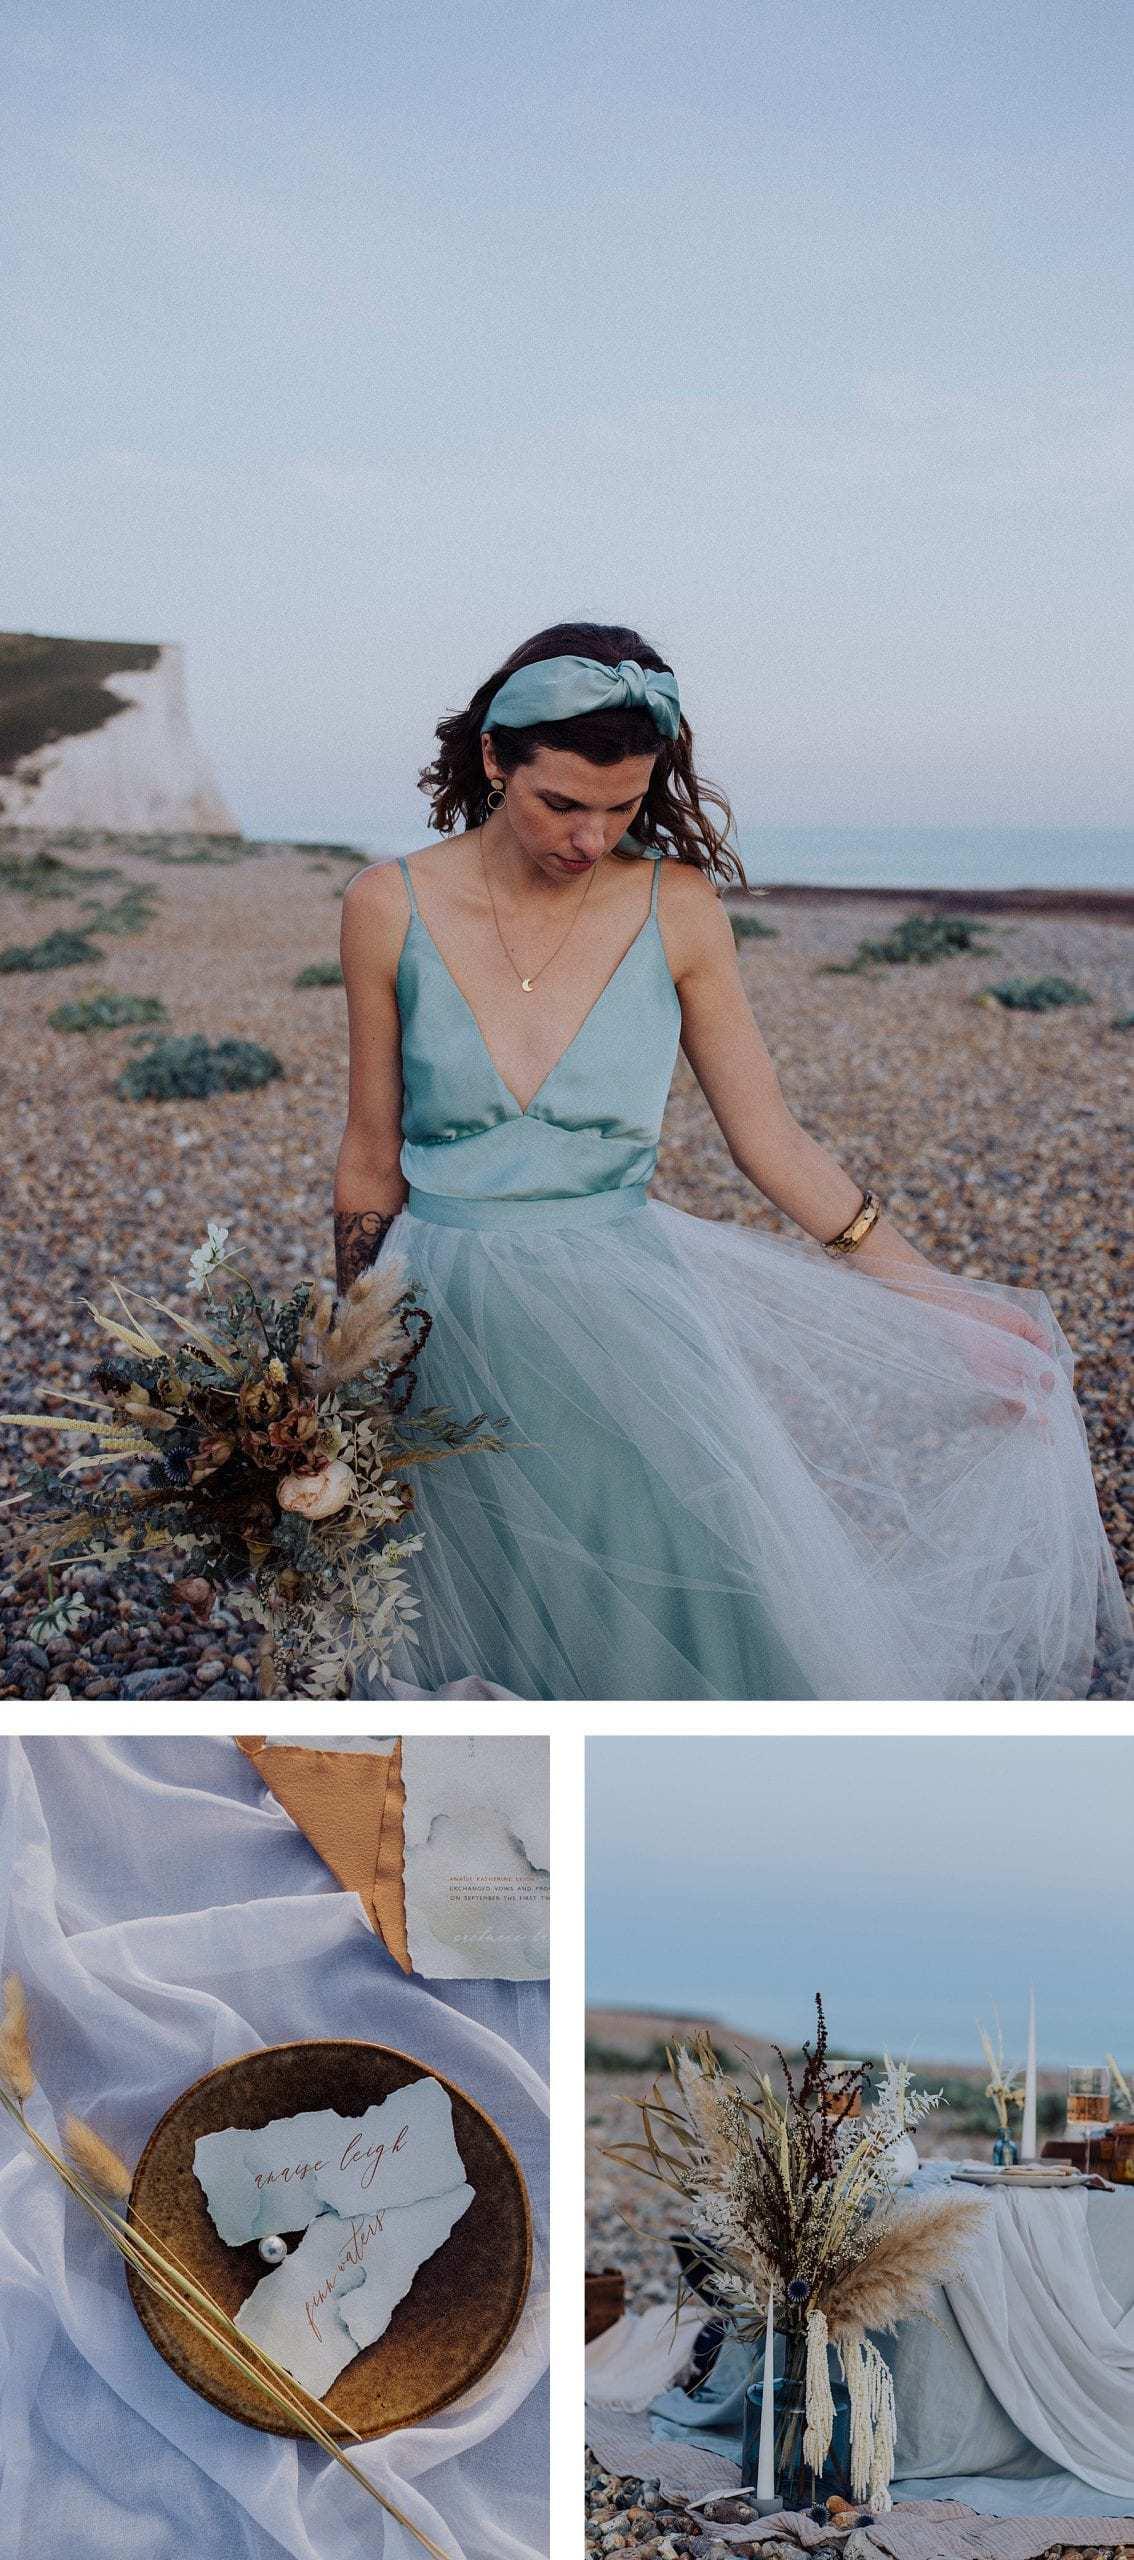 Wedding photos inspiration for a wedding by the sea